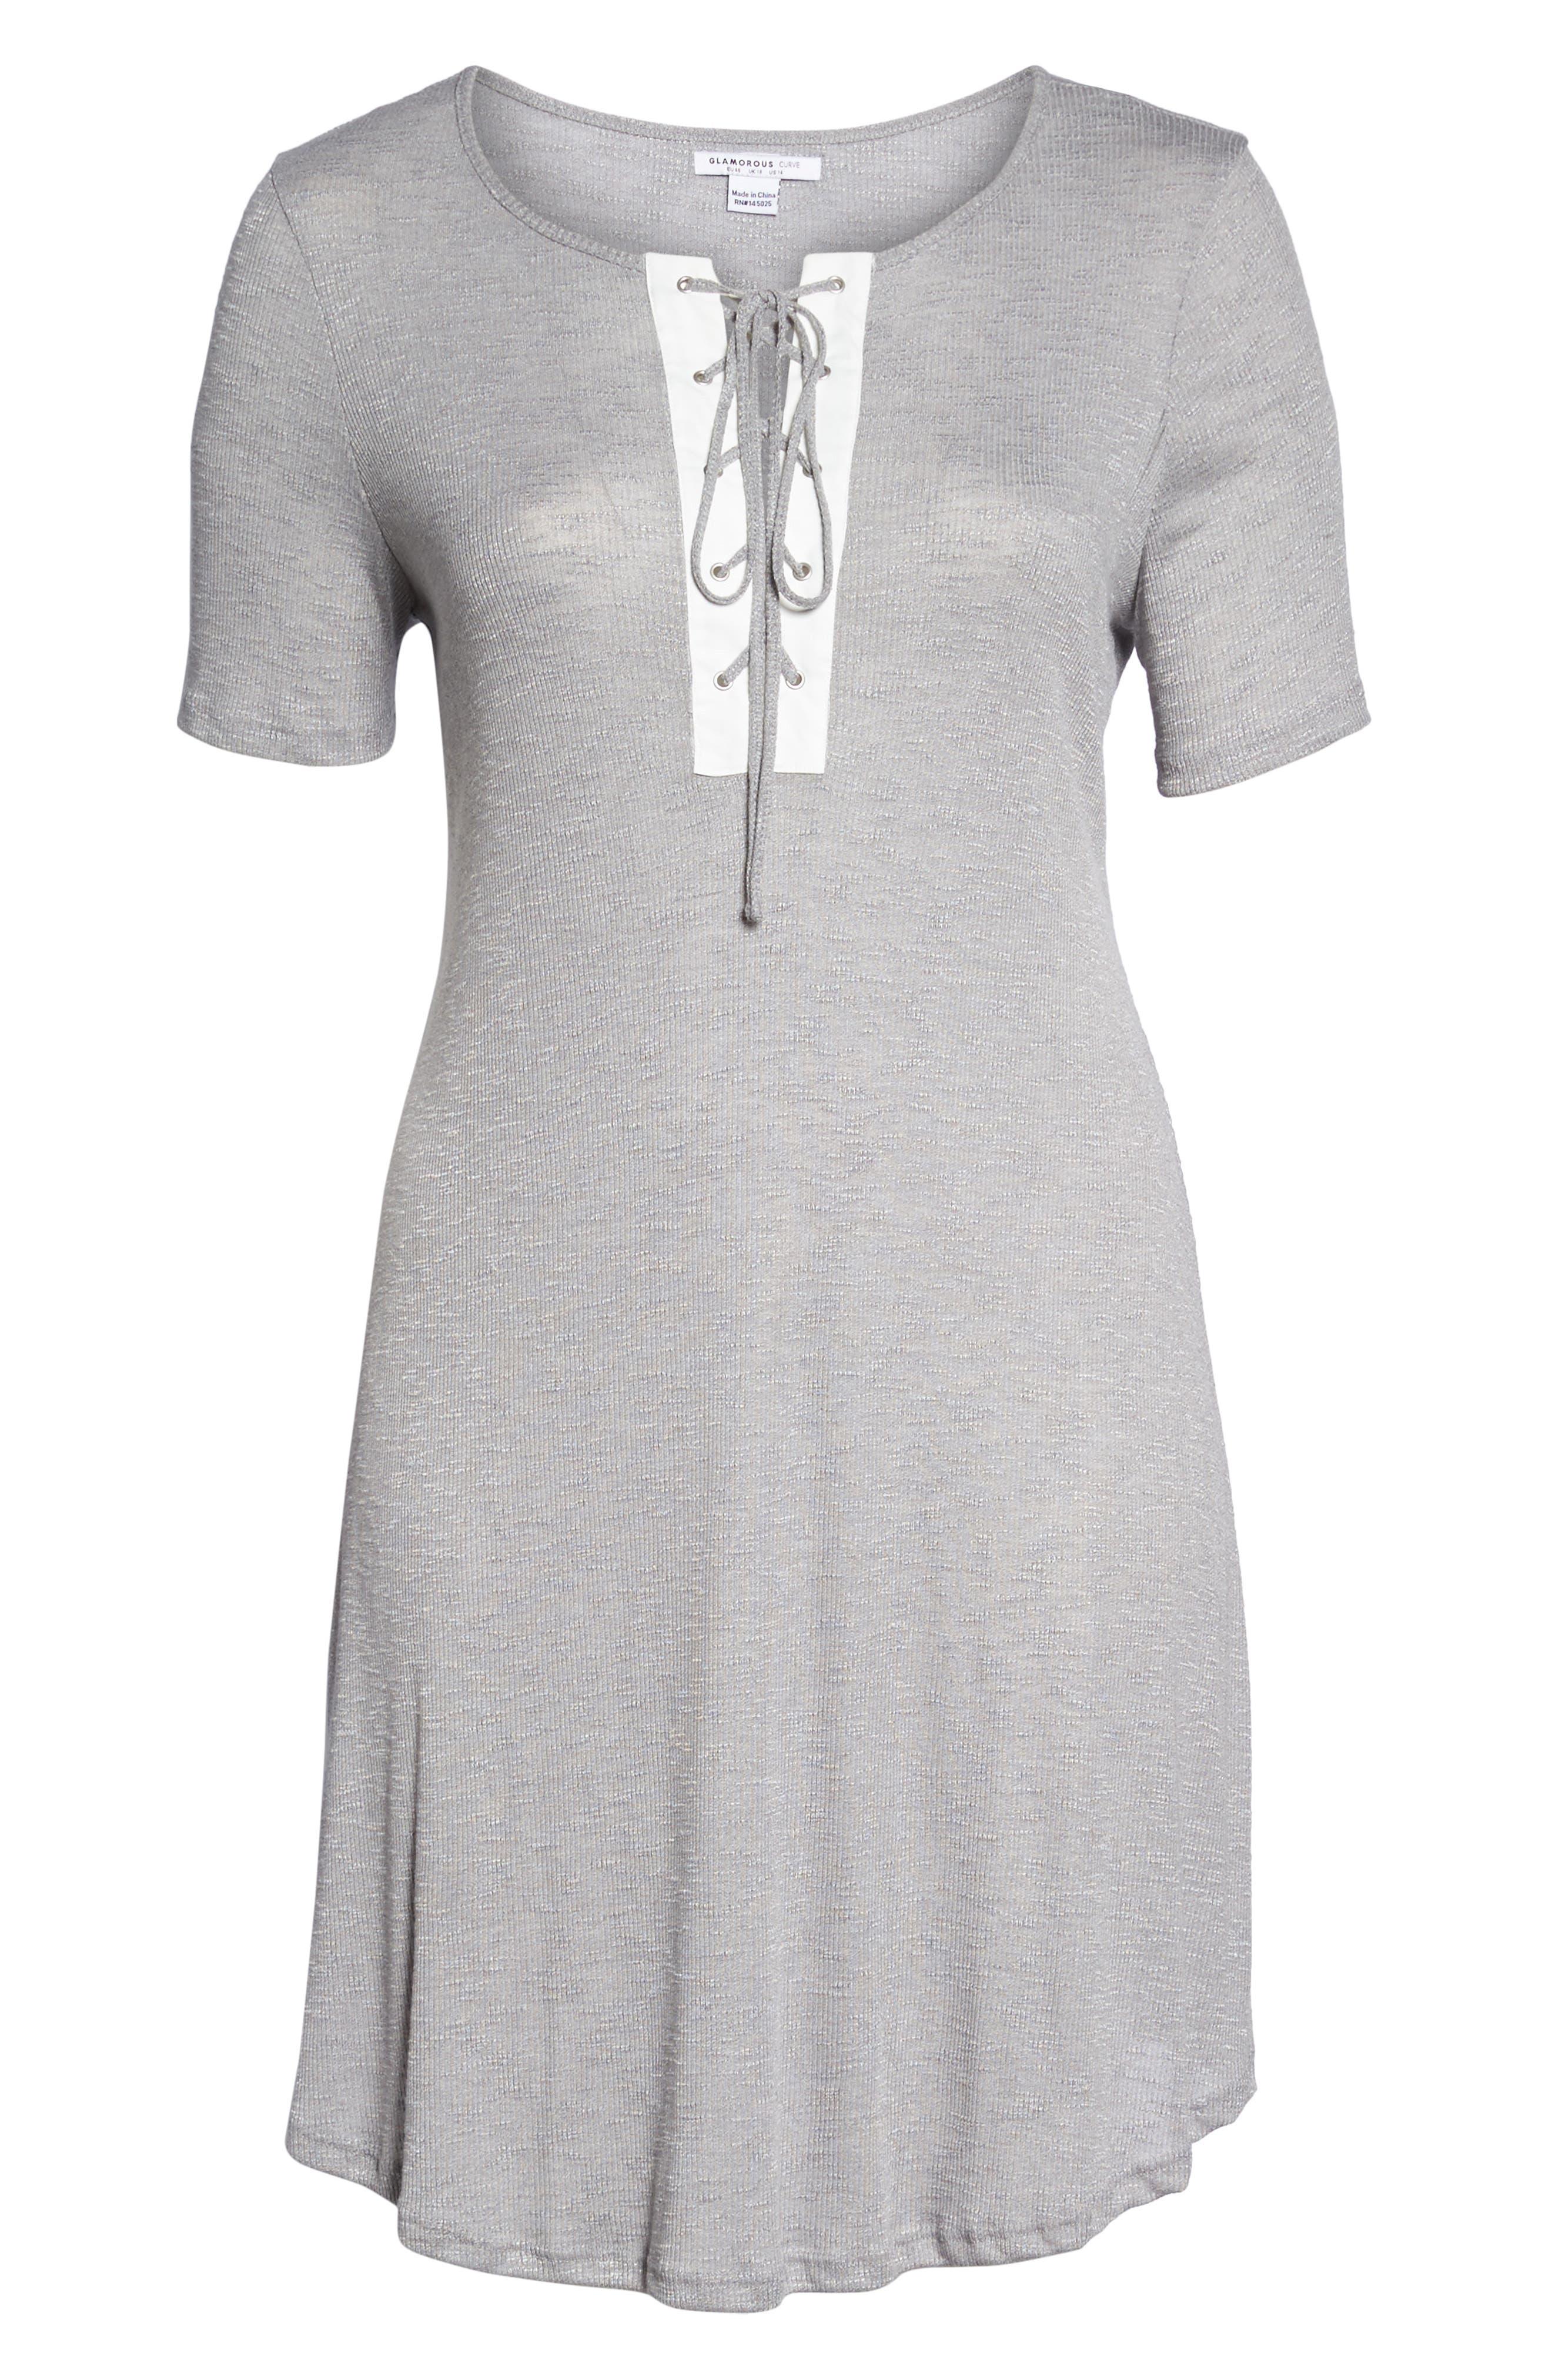 Lace-Up Knit Shift Dress,                             Alternate thumbnail 6, color,                             Grey